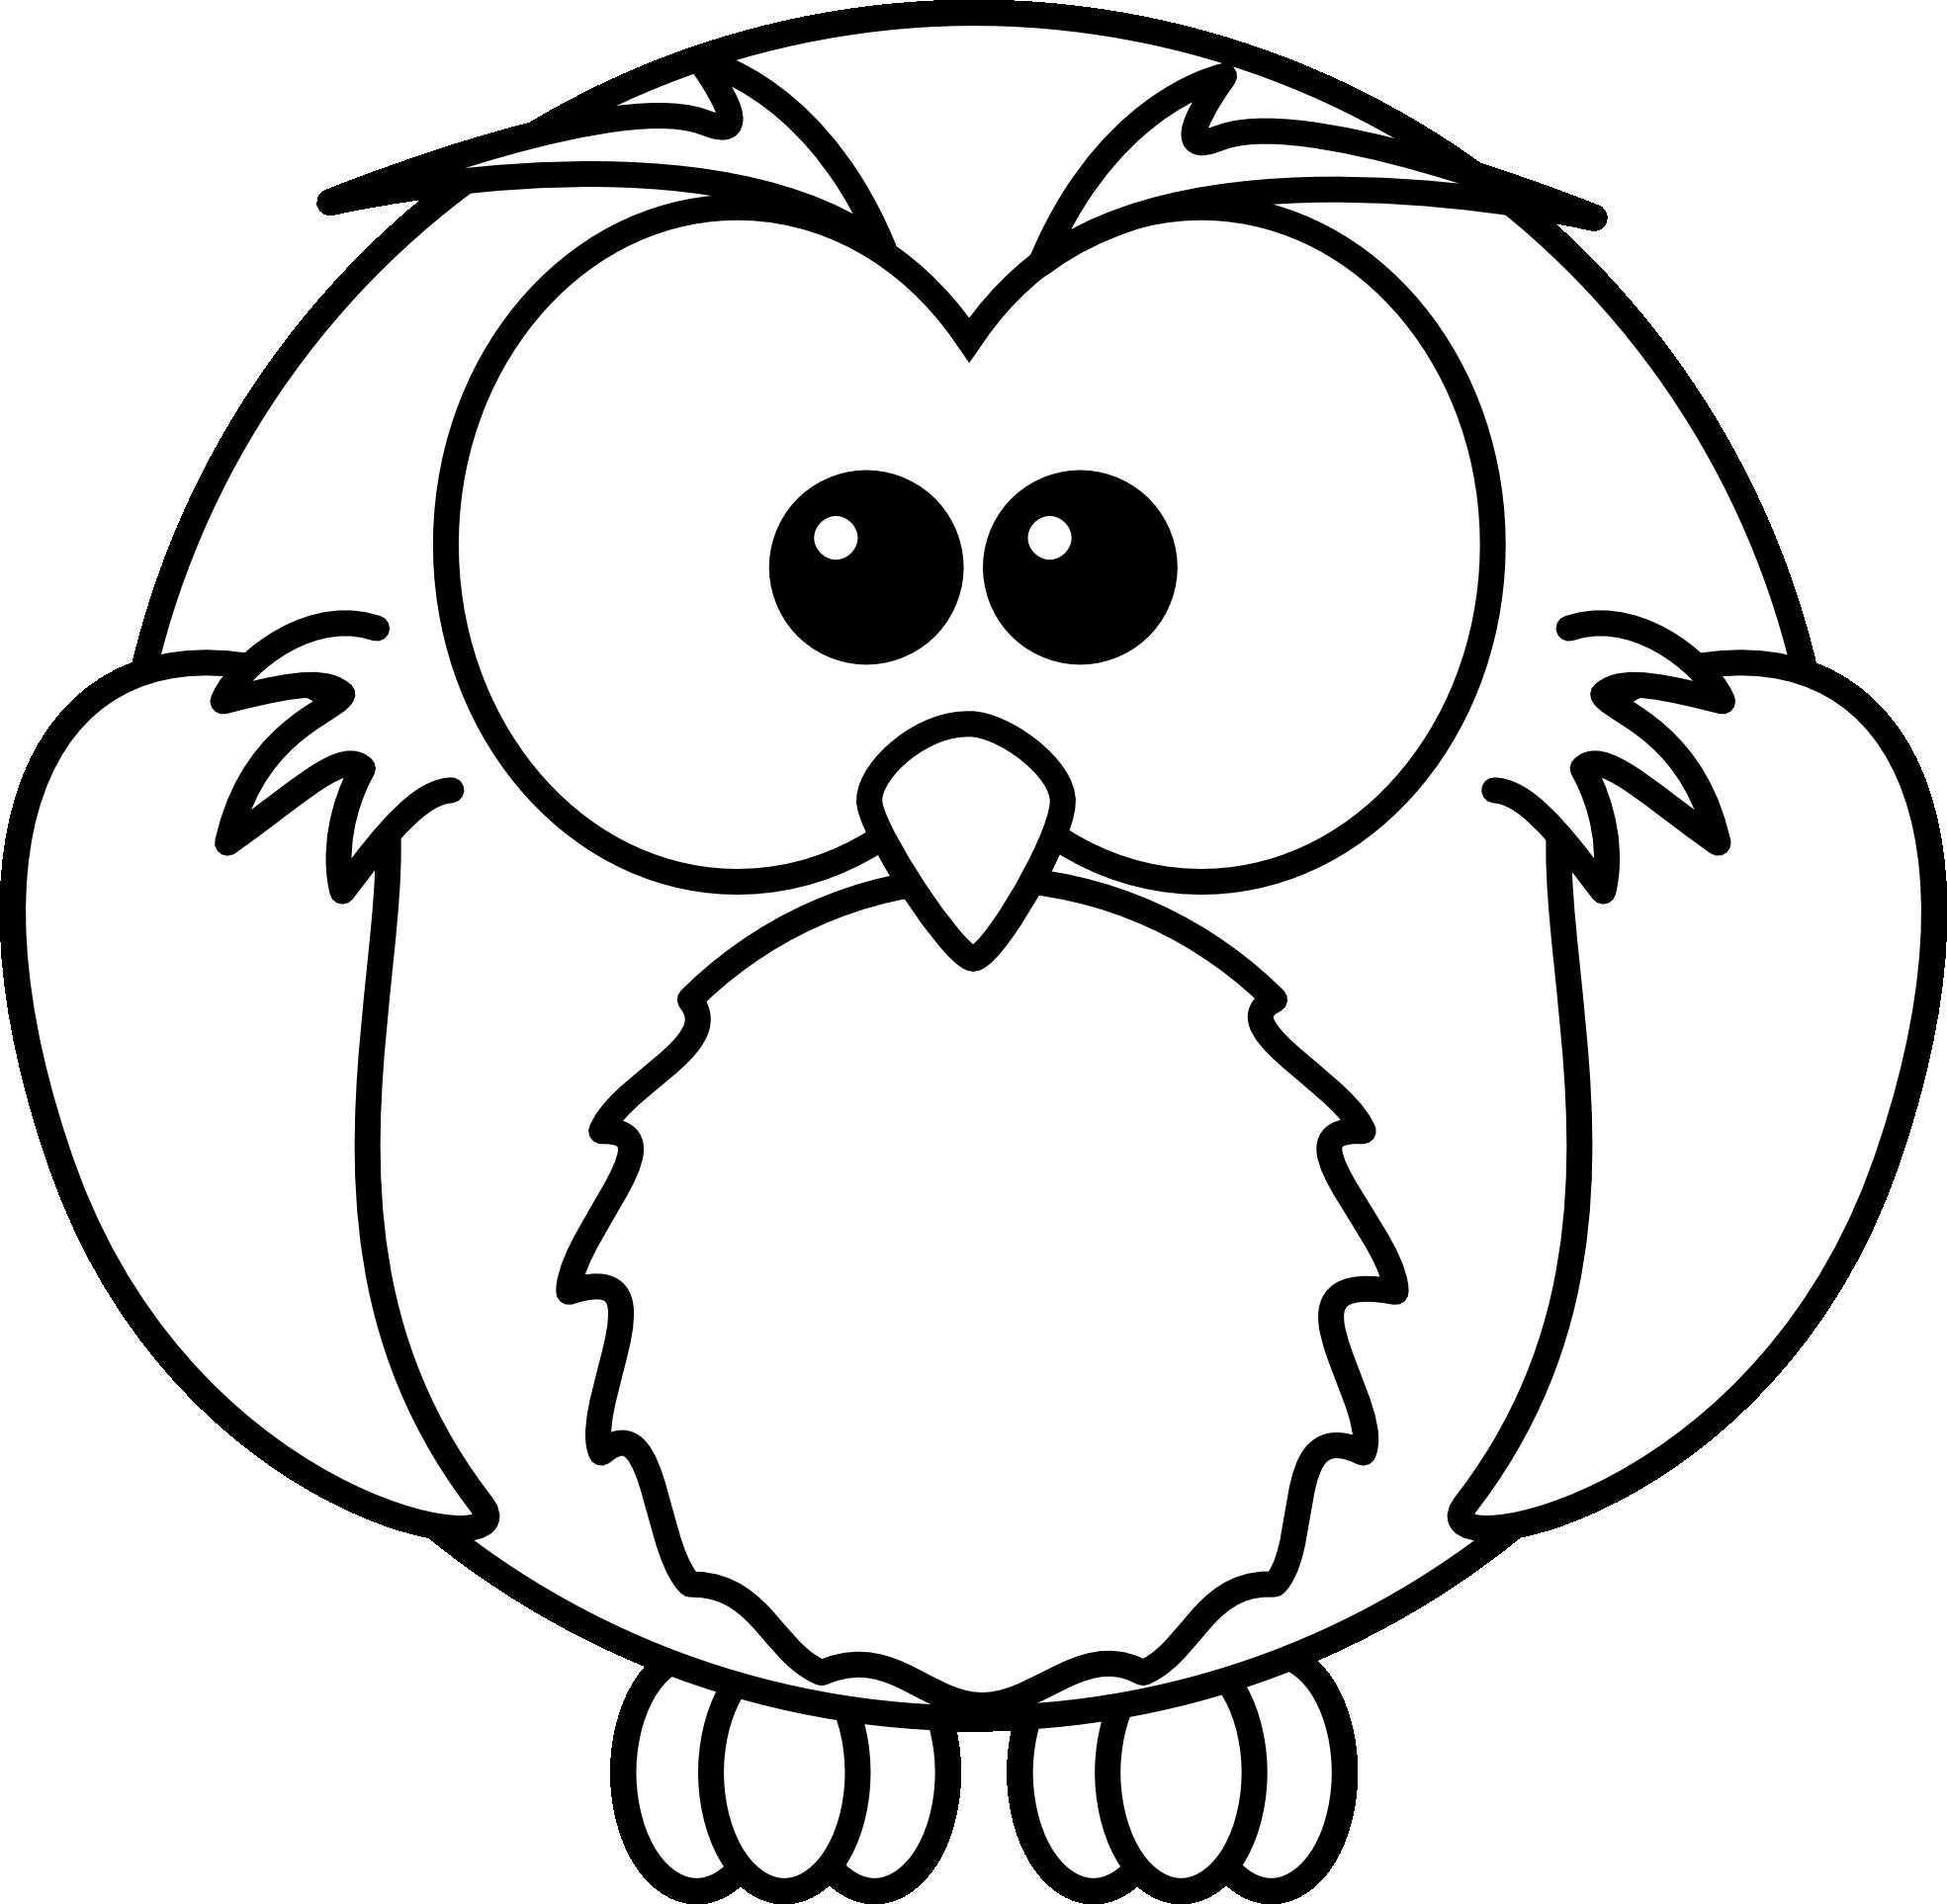 Black And White Owl Clip Art